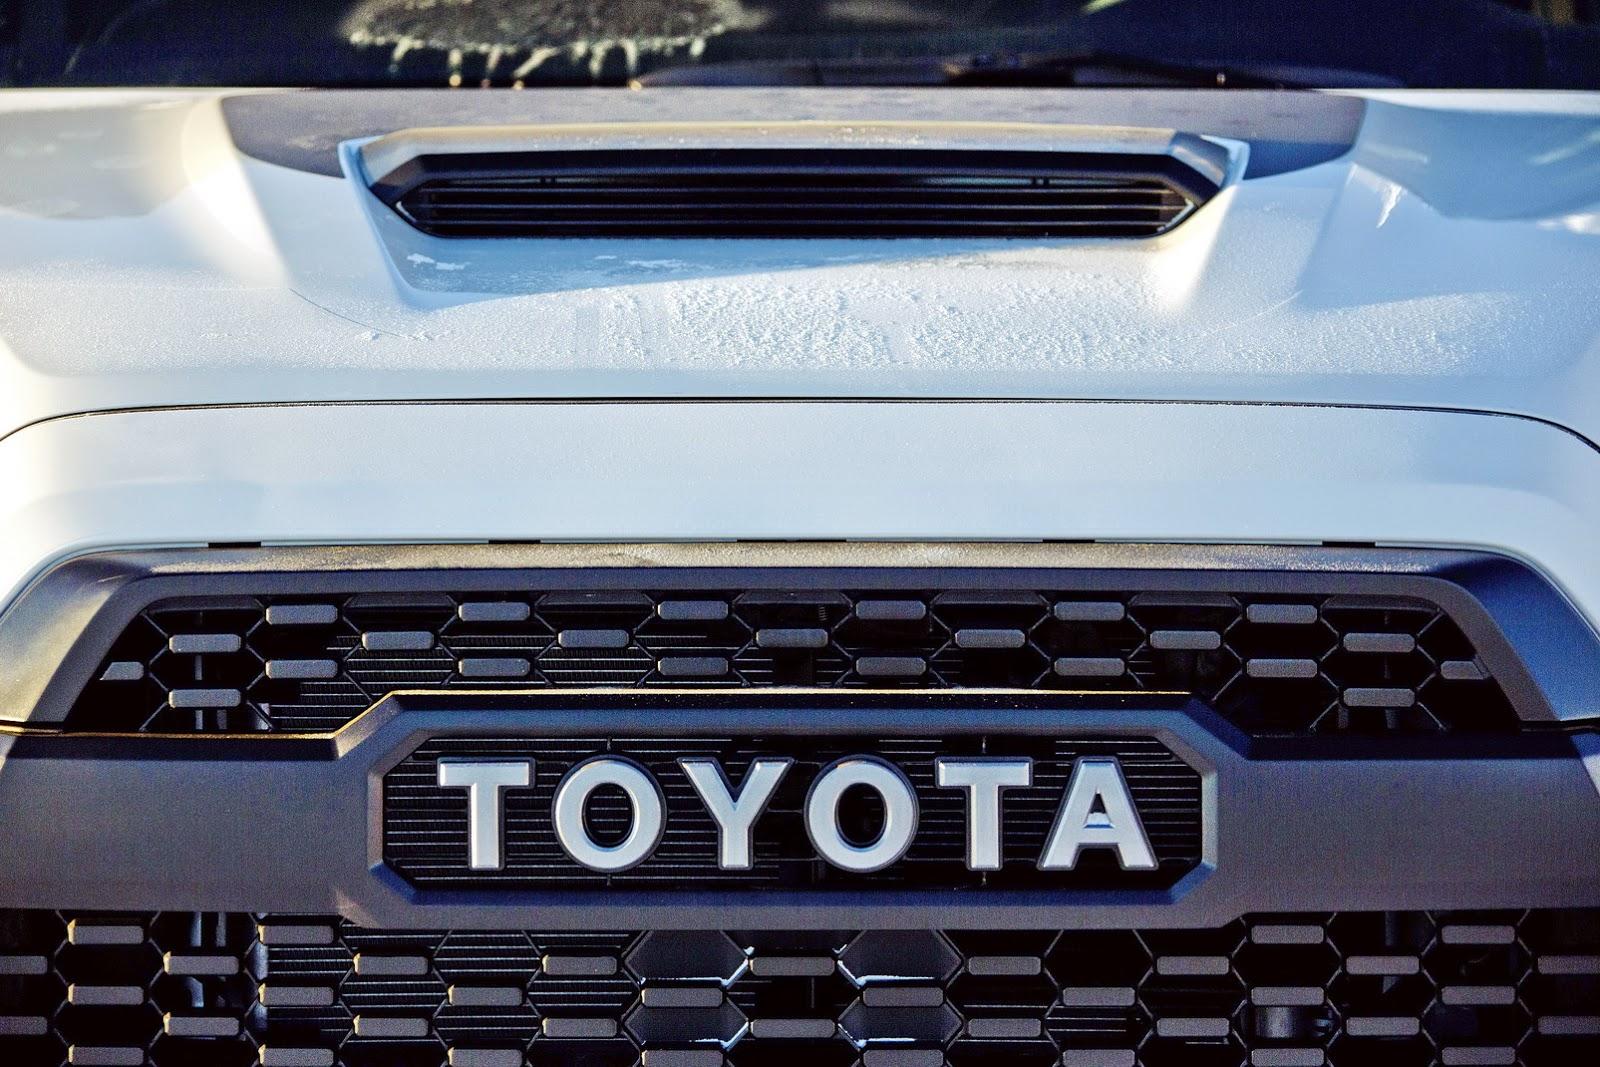 2017 Toyota Tacoma Trd Pro Is Like A Japanese Raptor